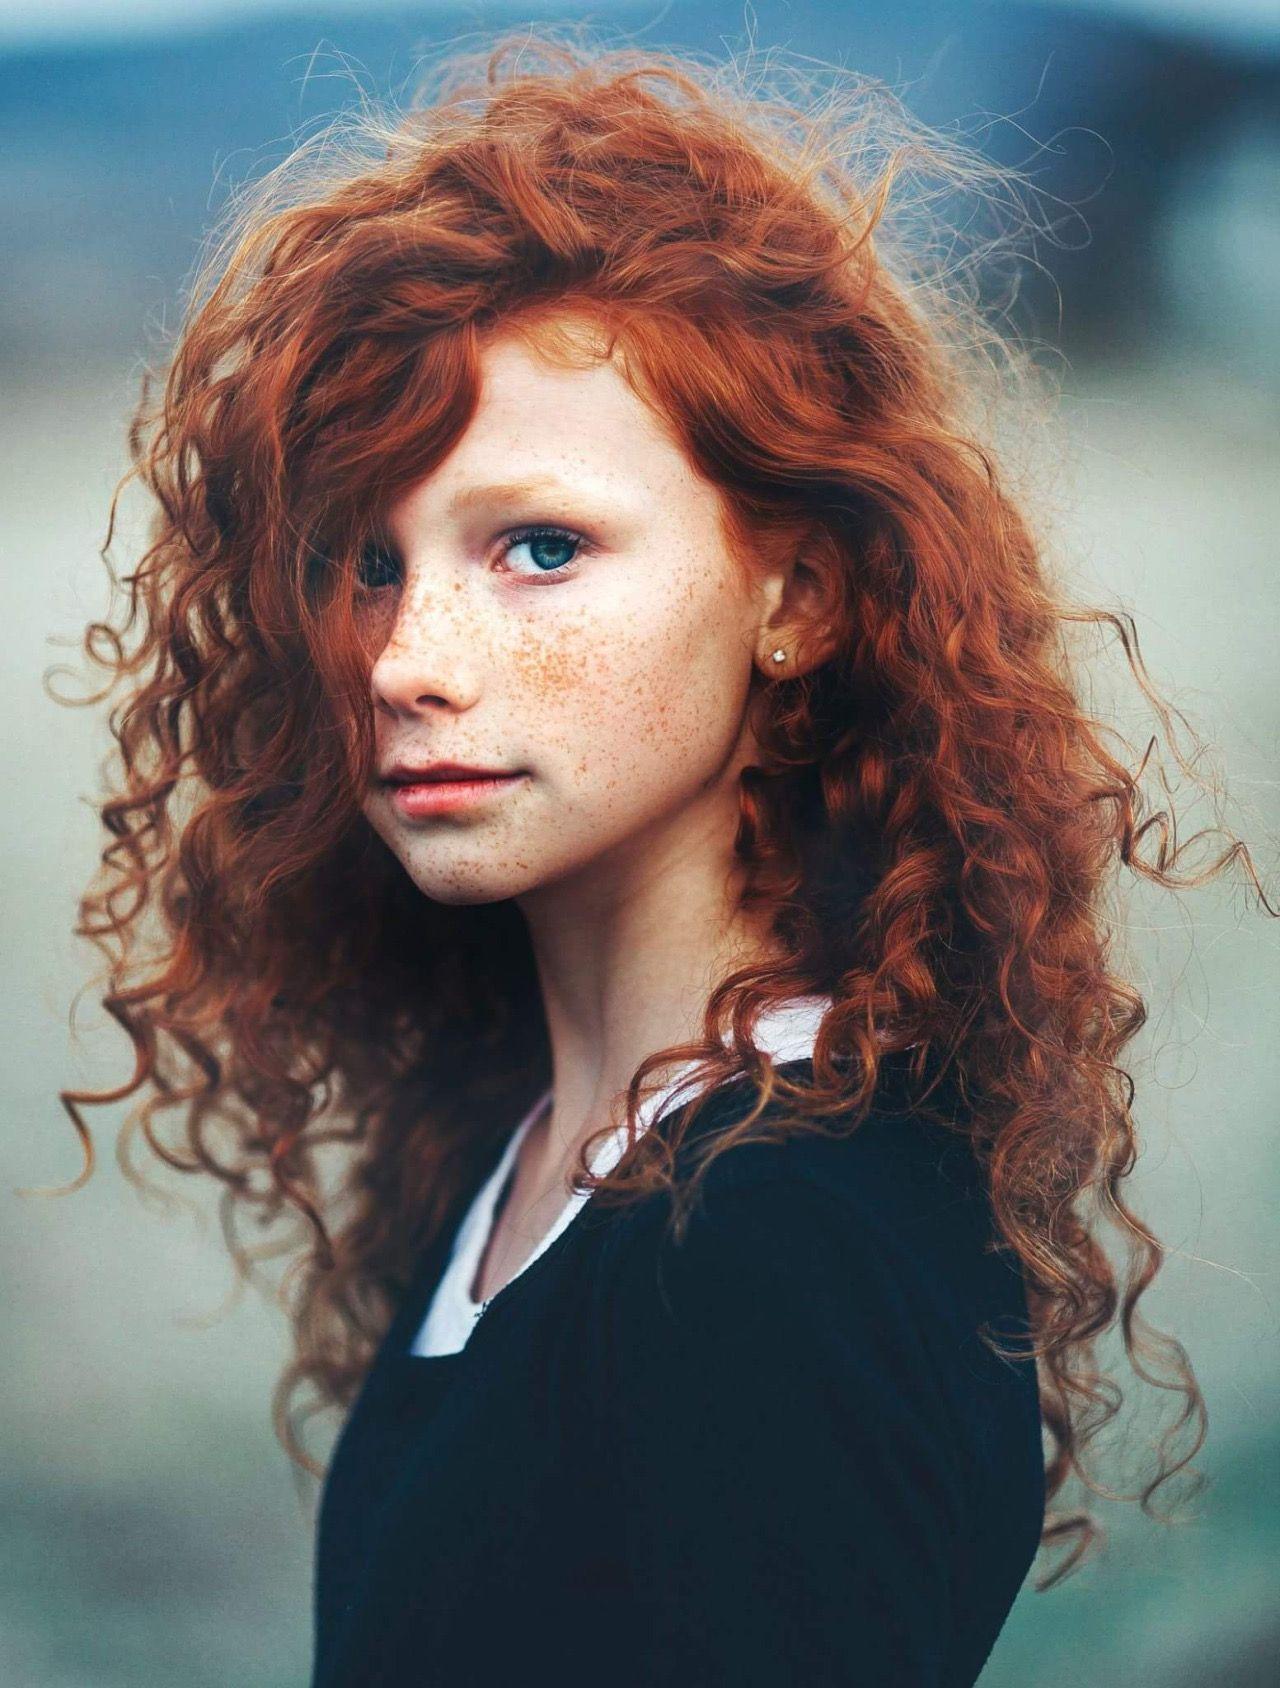 teen pov Young redhead